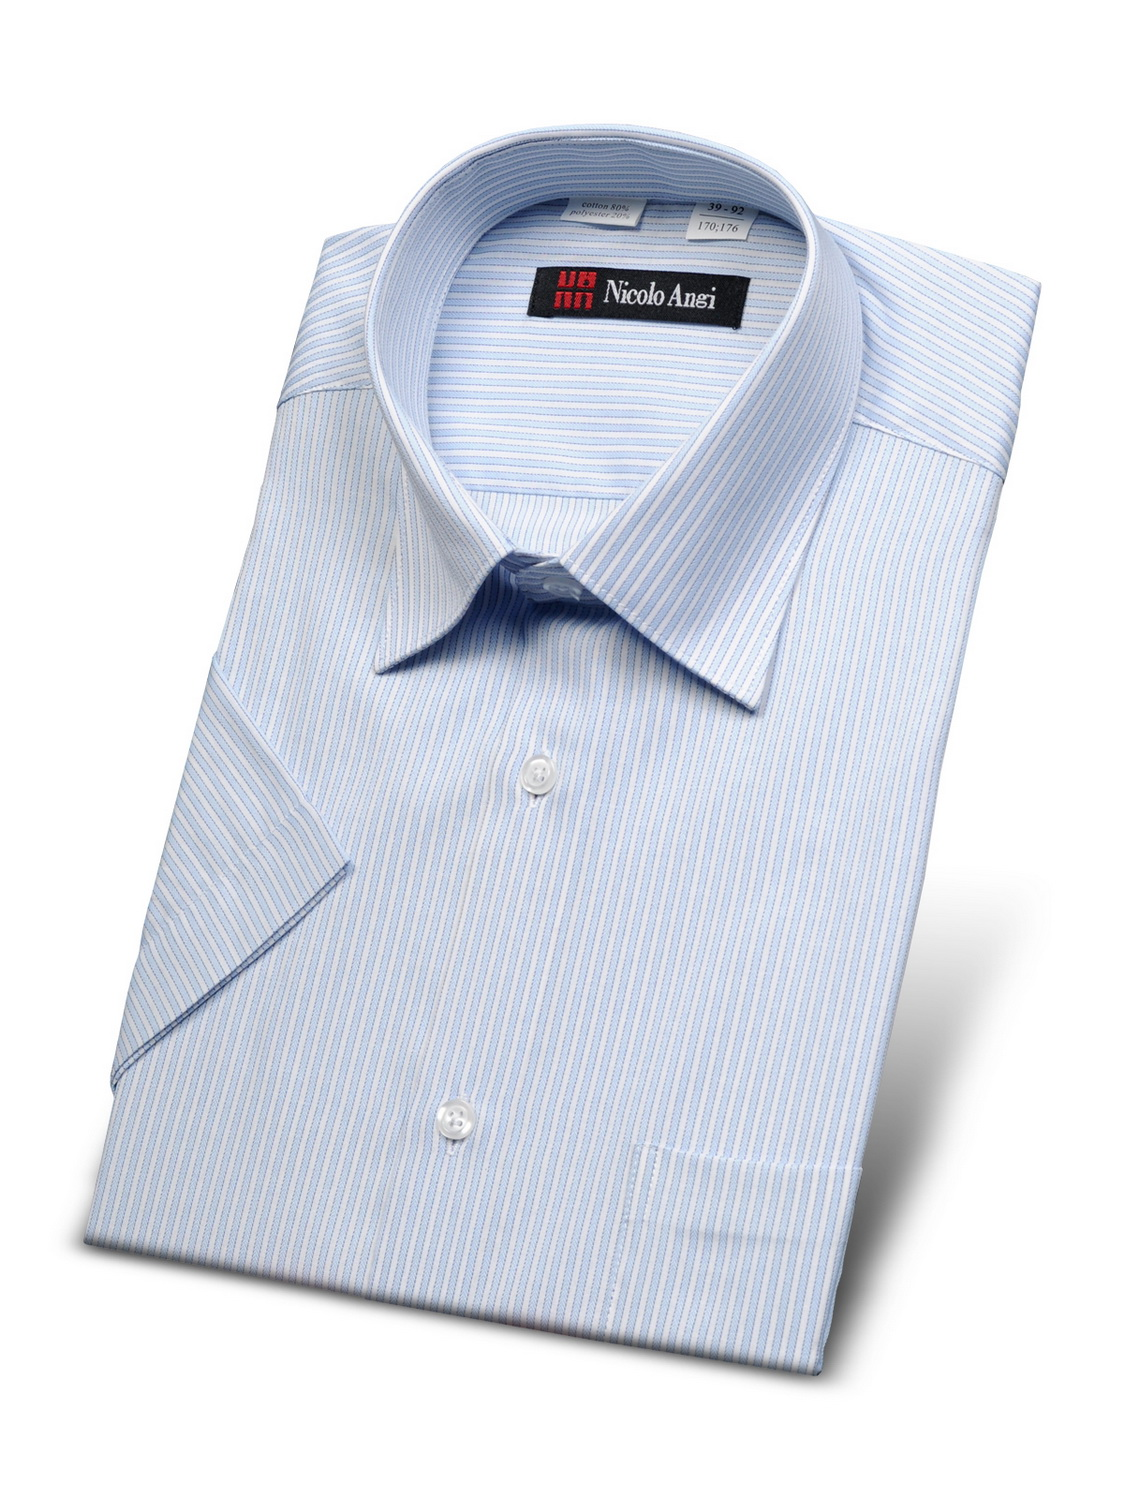 Рубашка мужская iv60709 бюстье serge 1006 7 рост 170